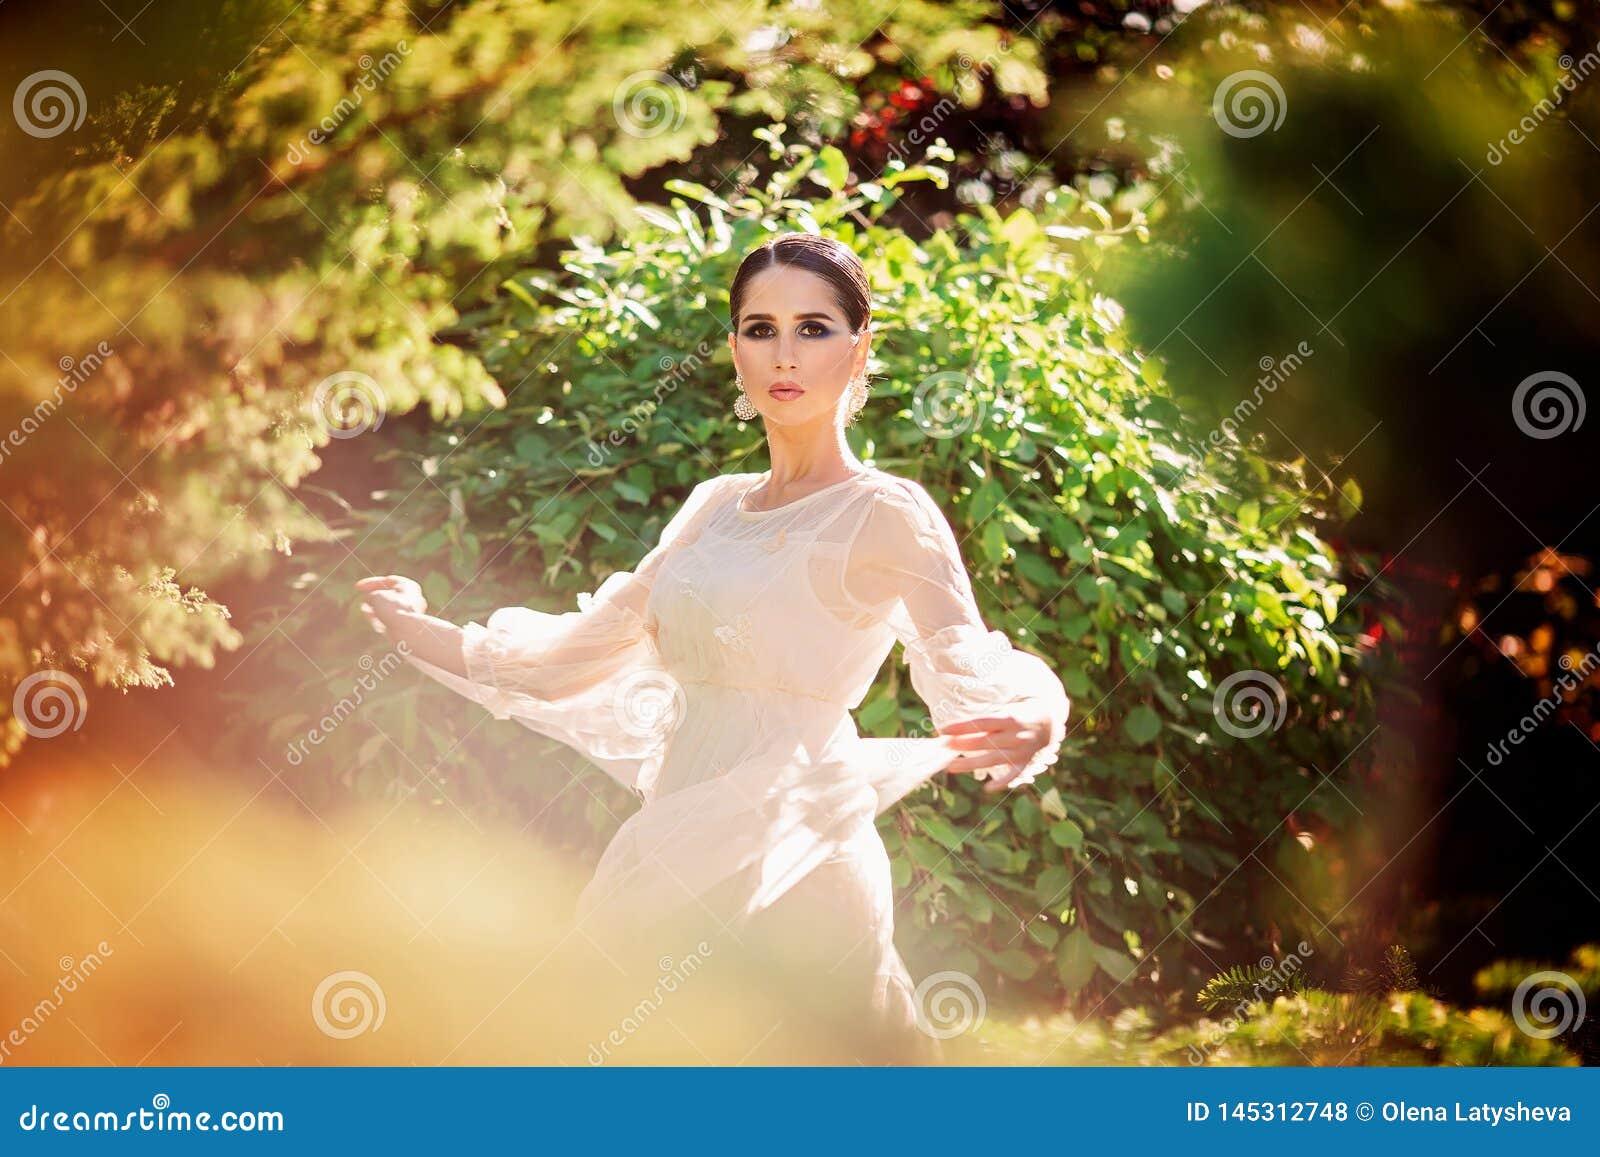 Beautiful lady dancing in sunlight garden